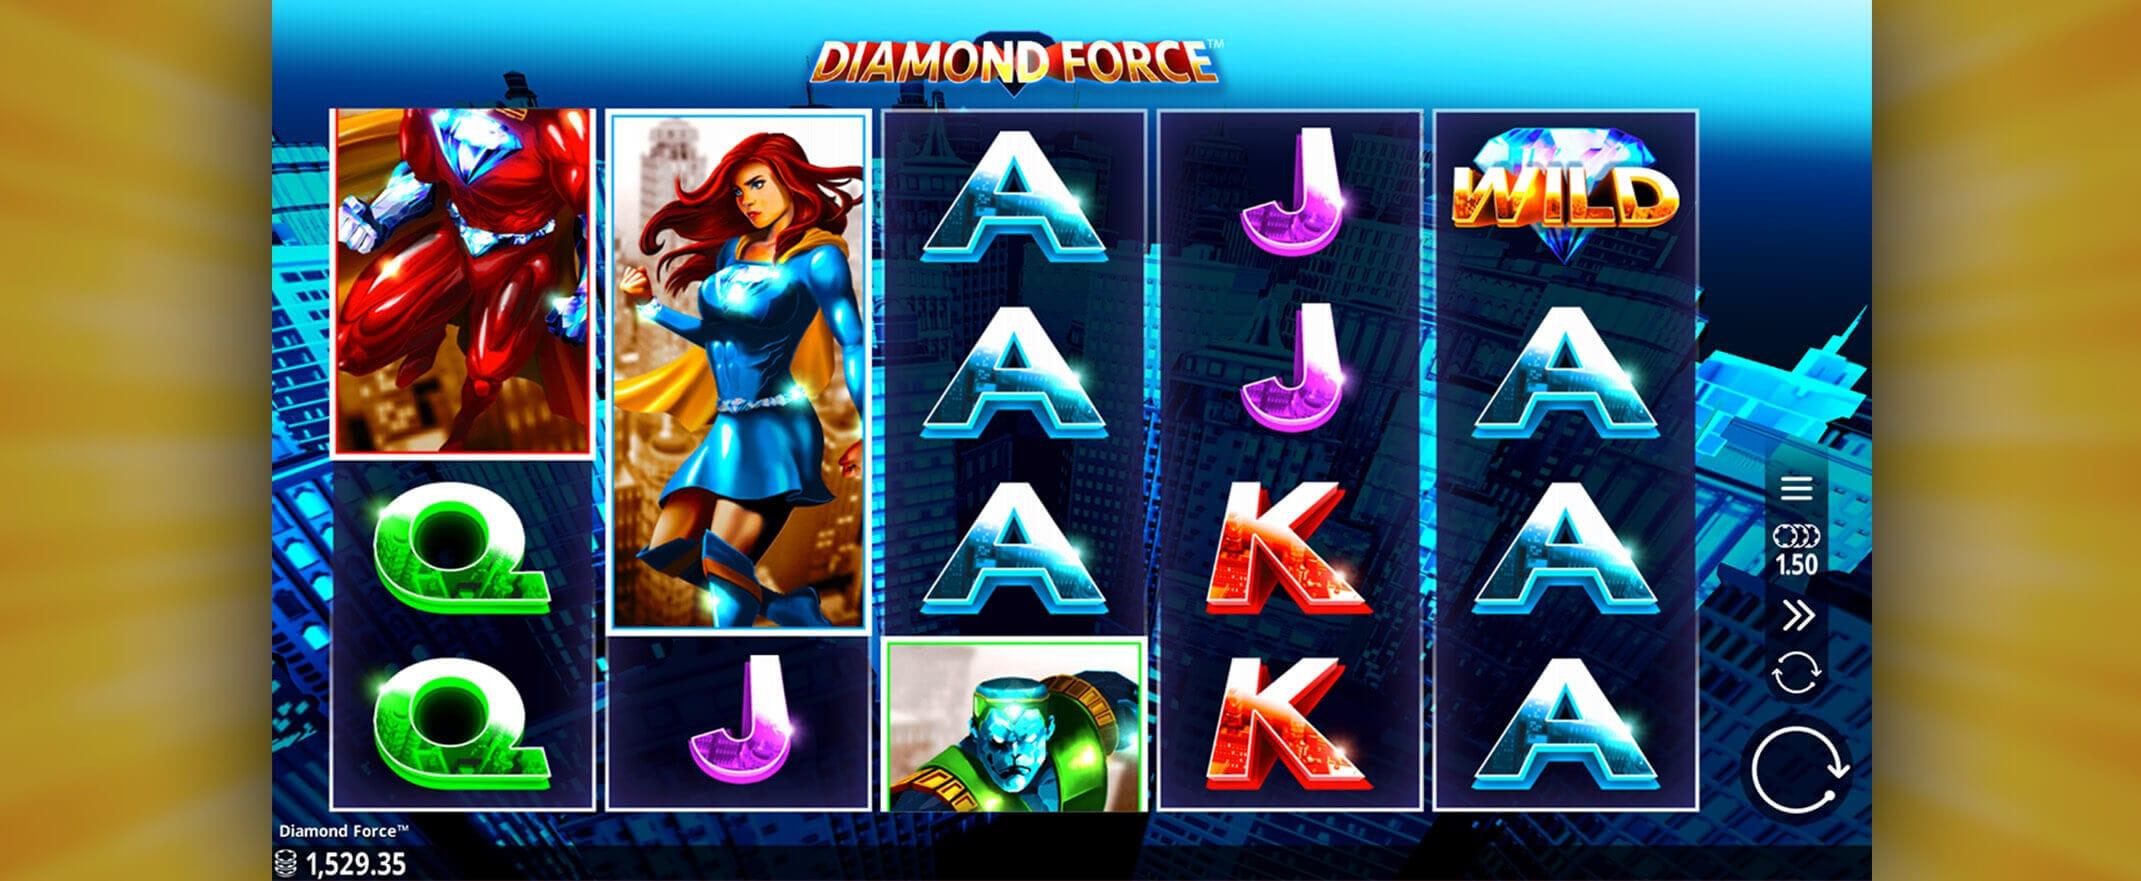 Diamond Force Gameplay